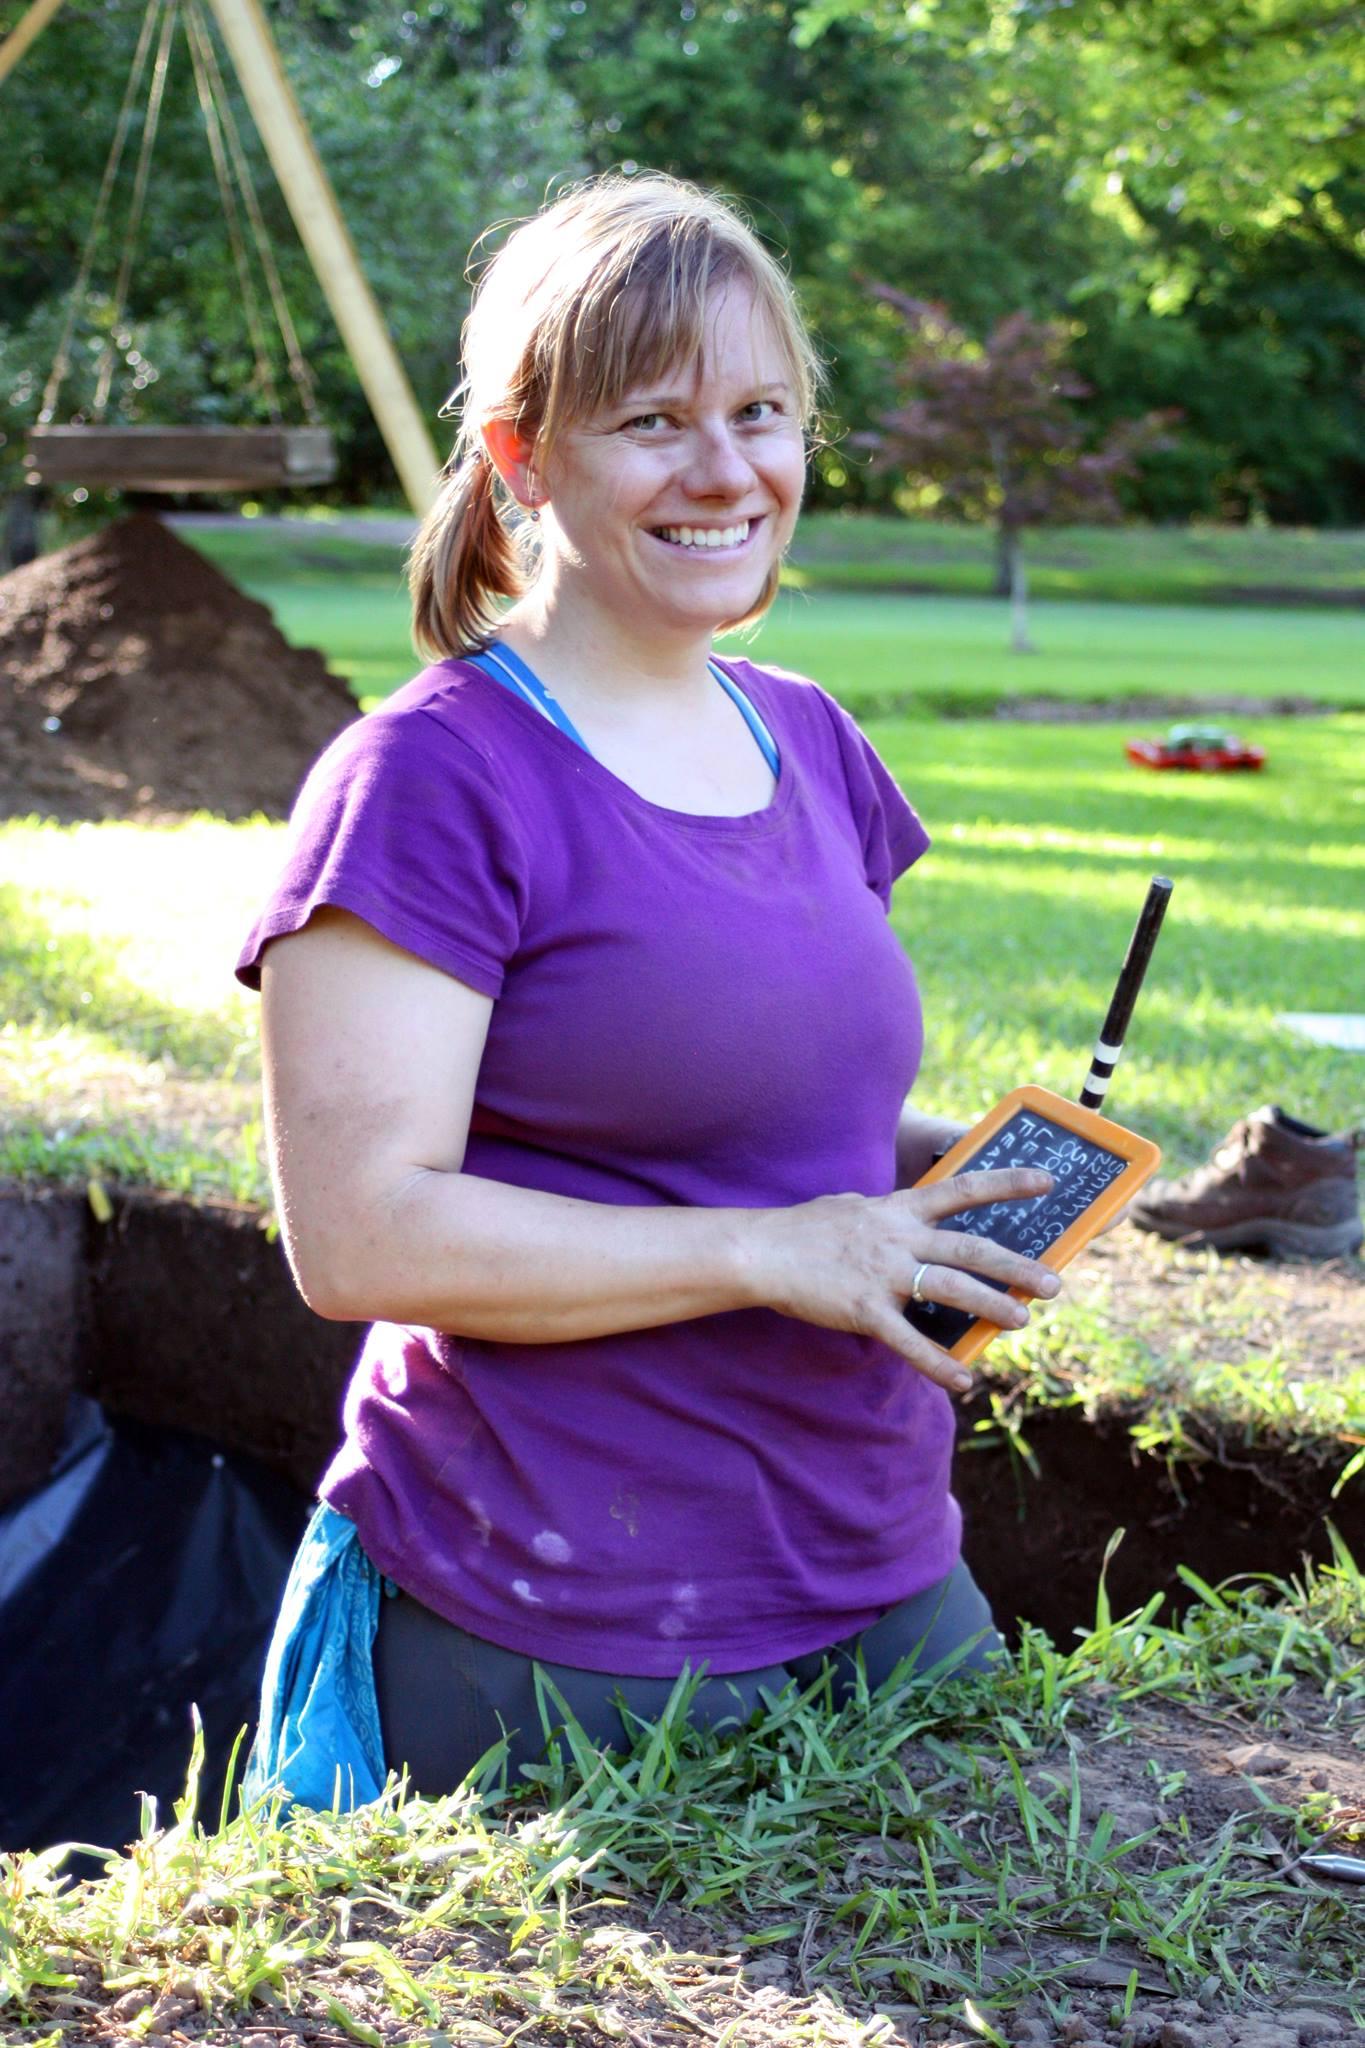 Research Tea with Dr. Megan Kassabaum, Archaeology without a Passport!